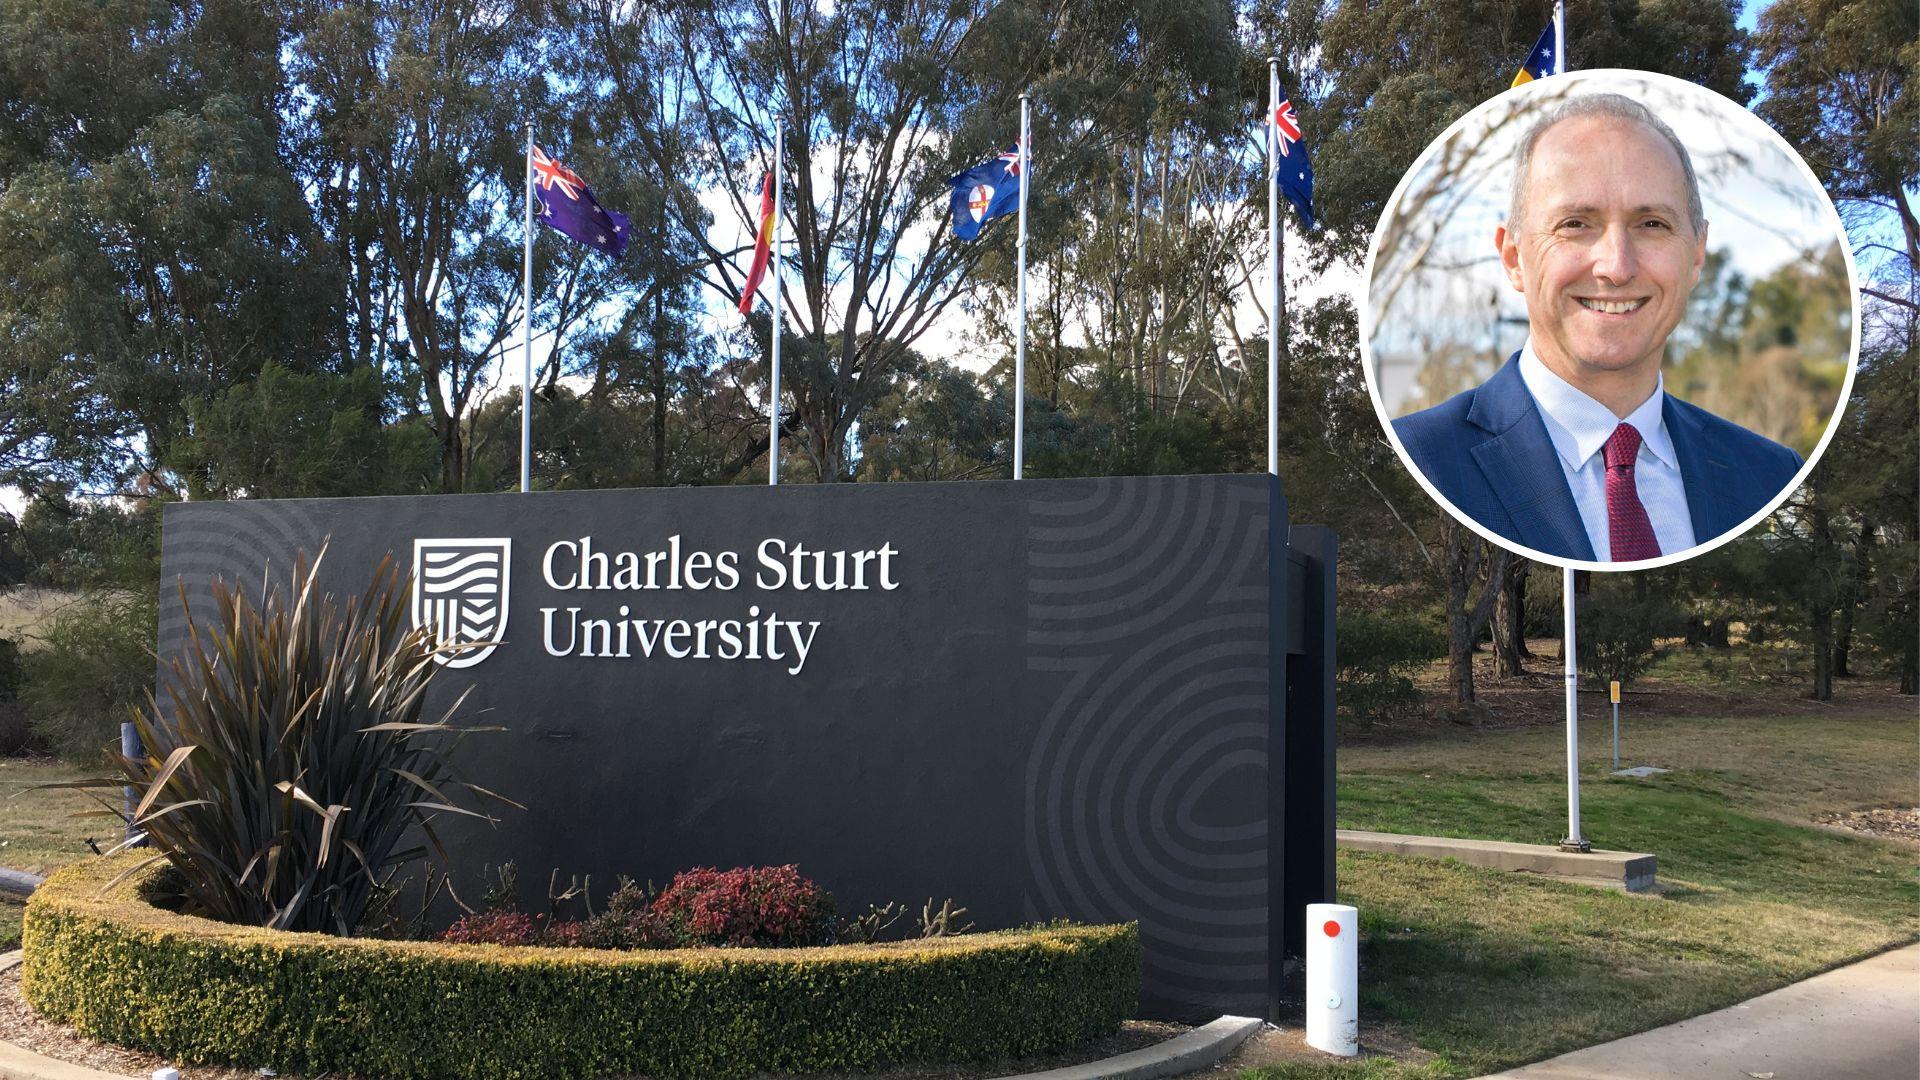 Charles Sturt maintains top rank for graduate employment among Australian universities